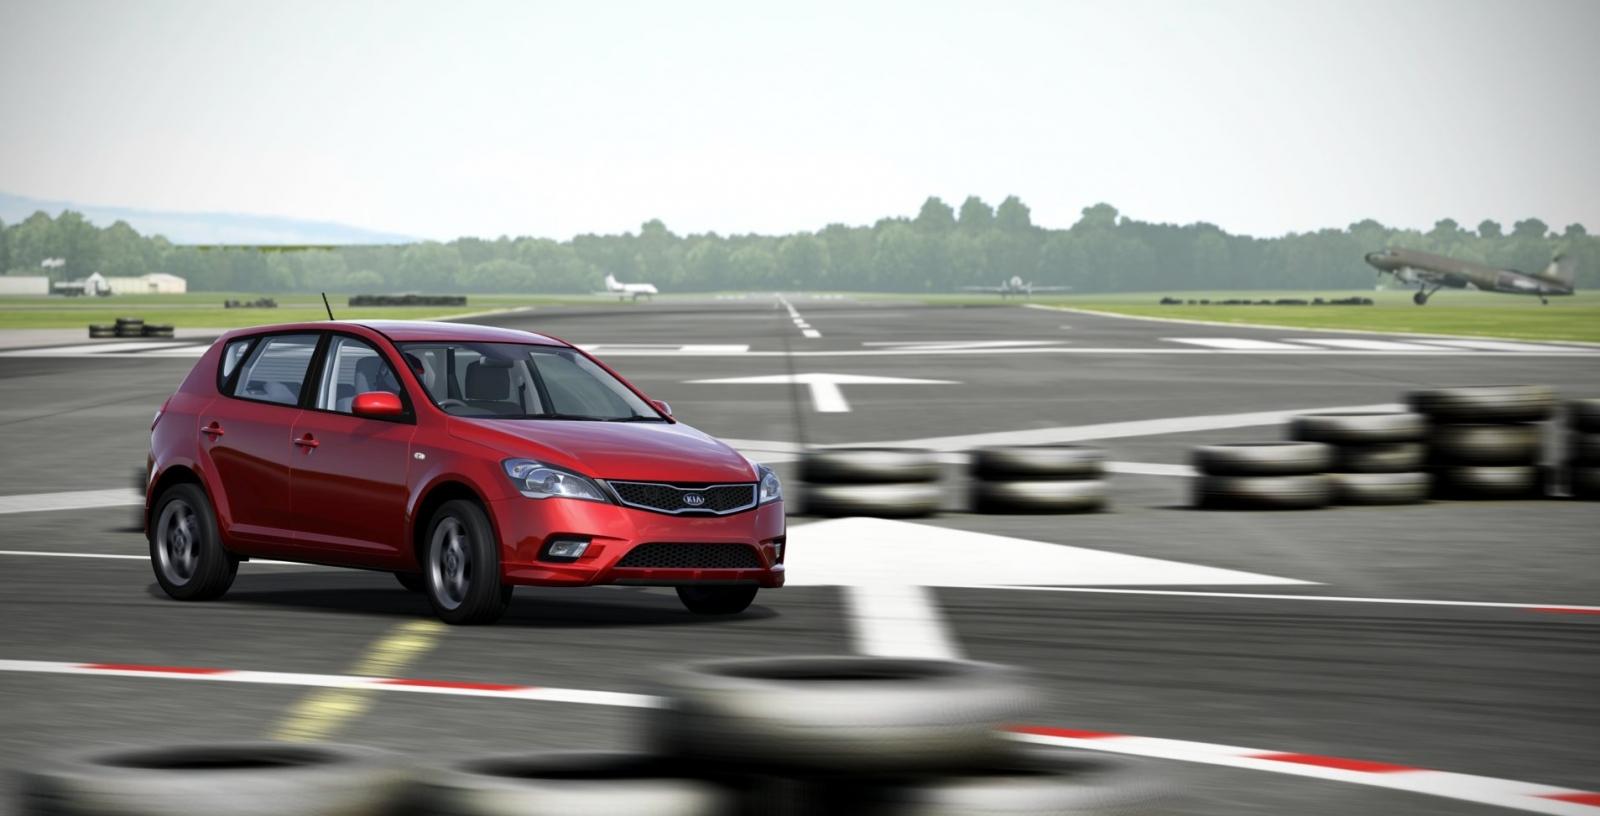 Kia Cee'd Forza 5 Top Gear